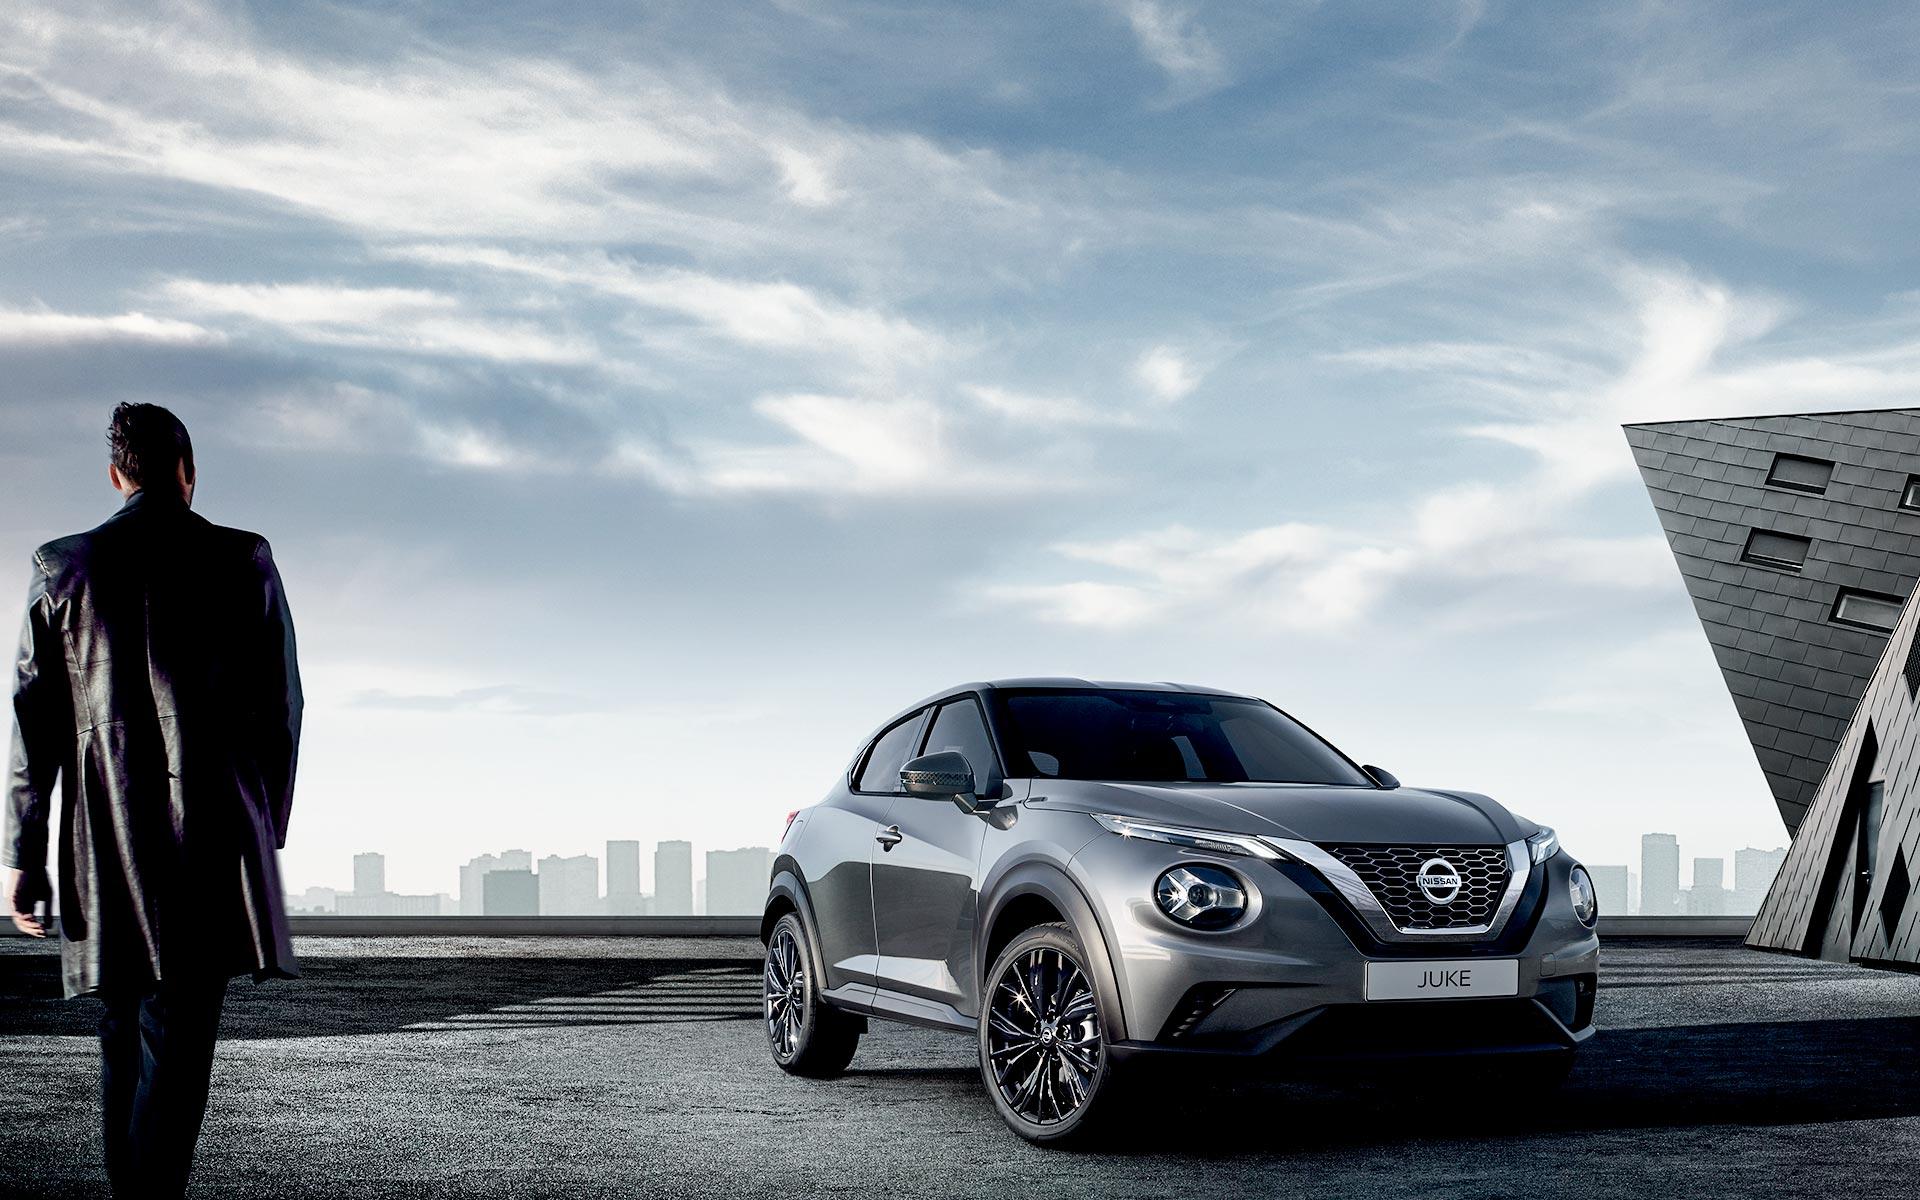 Nissan Juke Groupe Chevalley